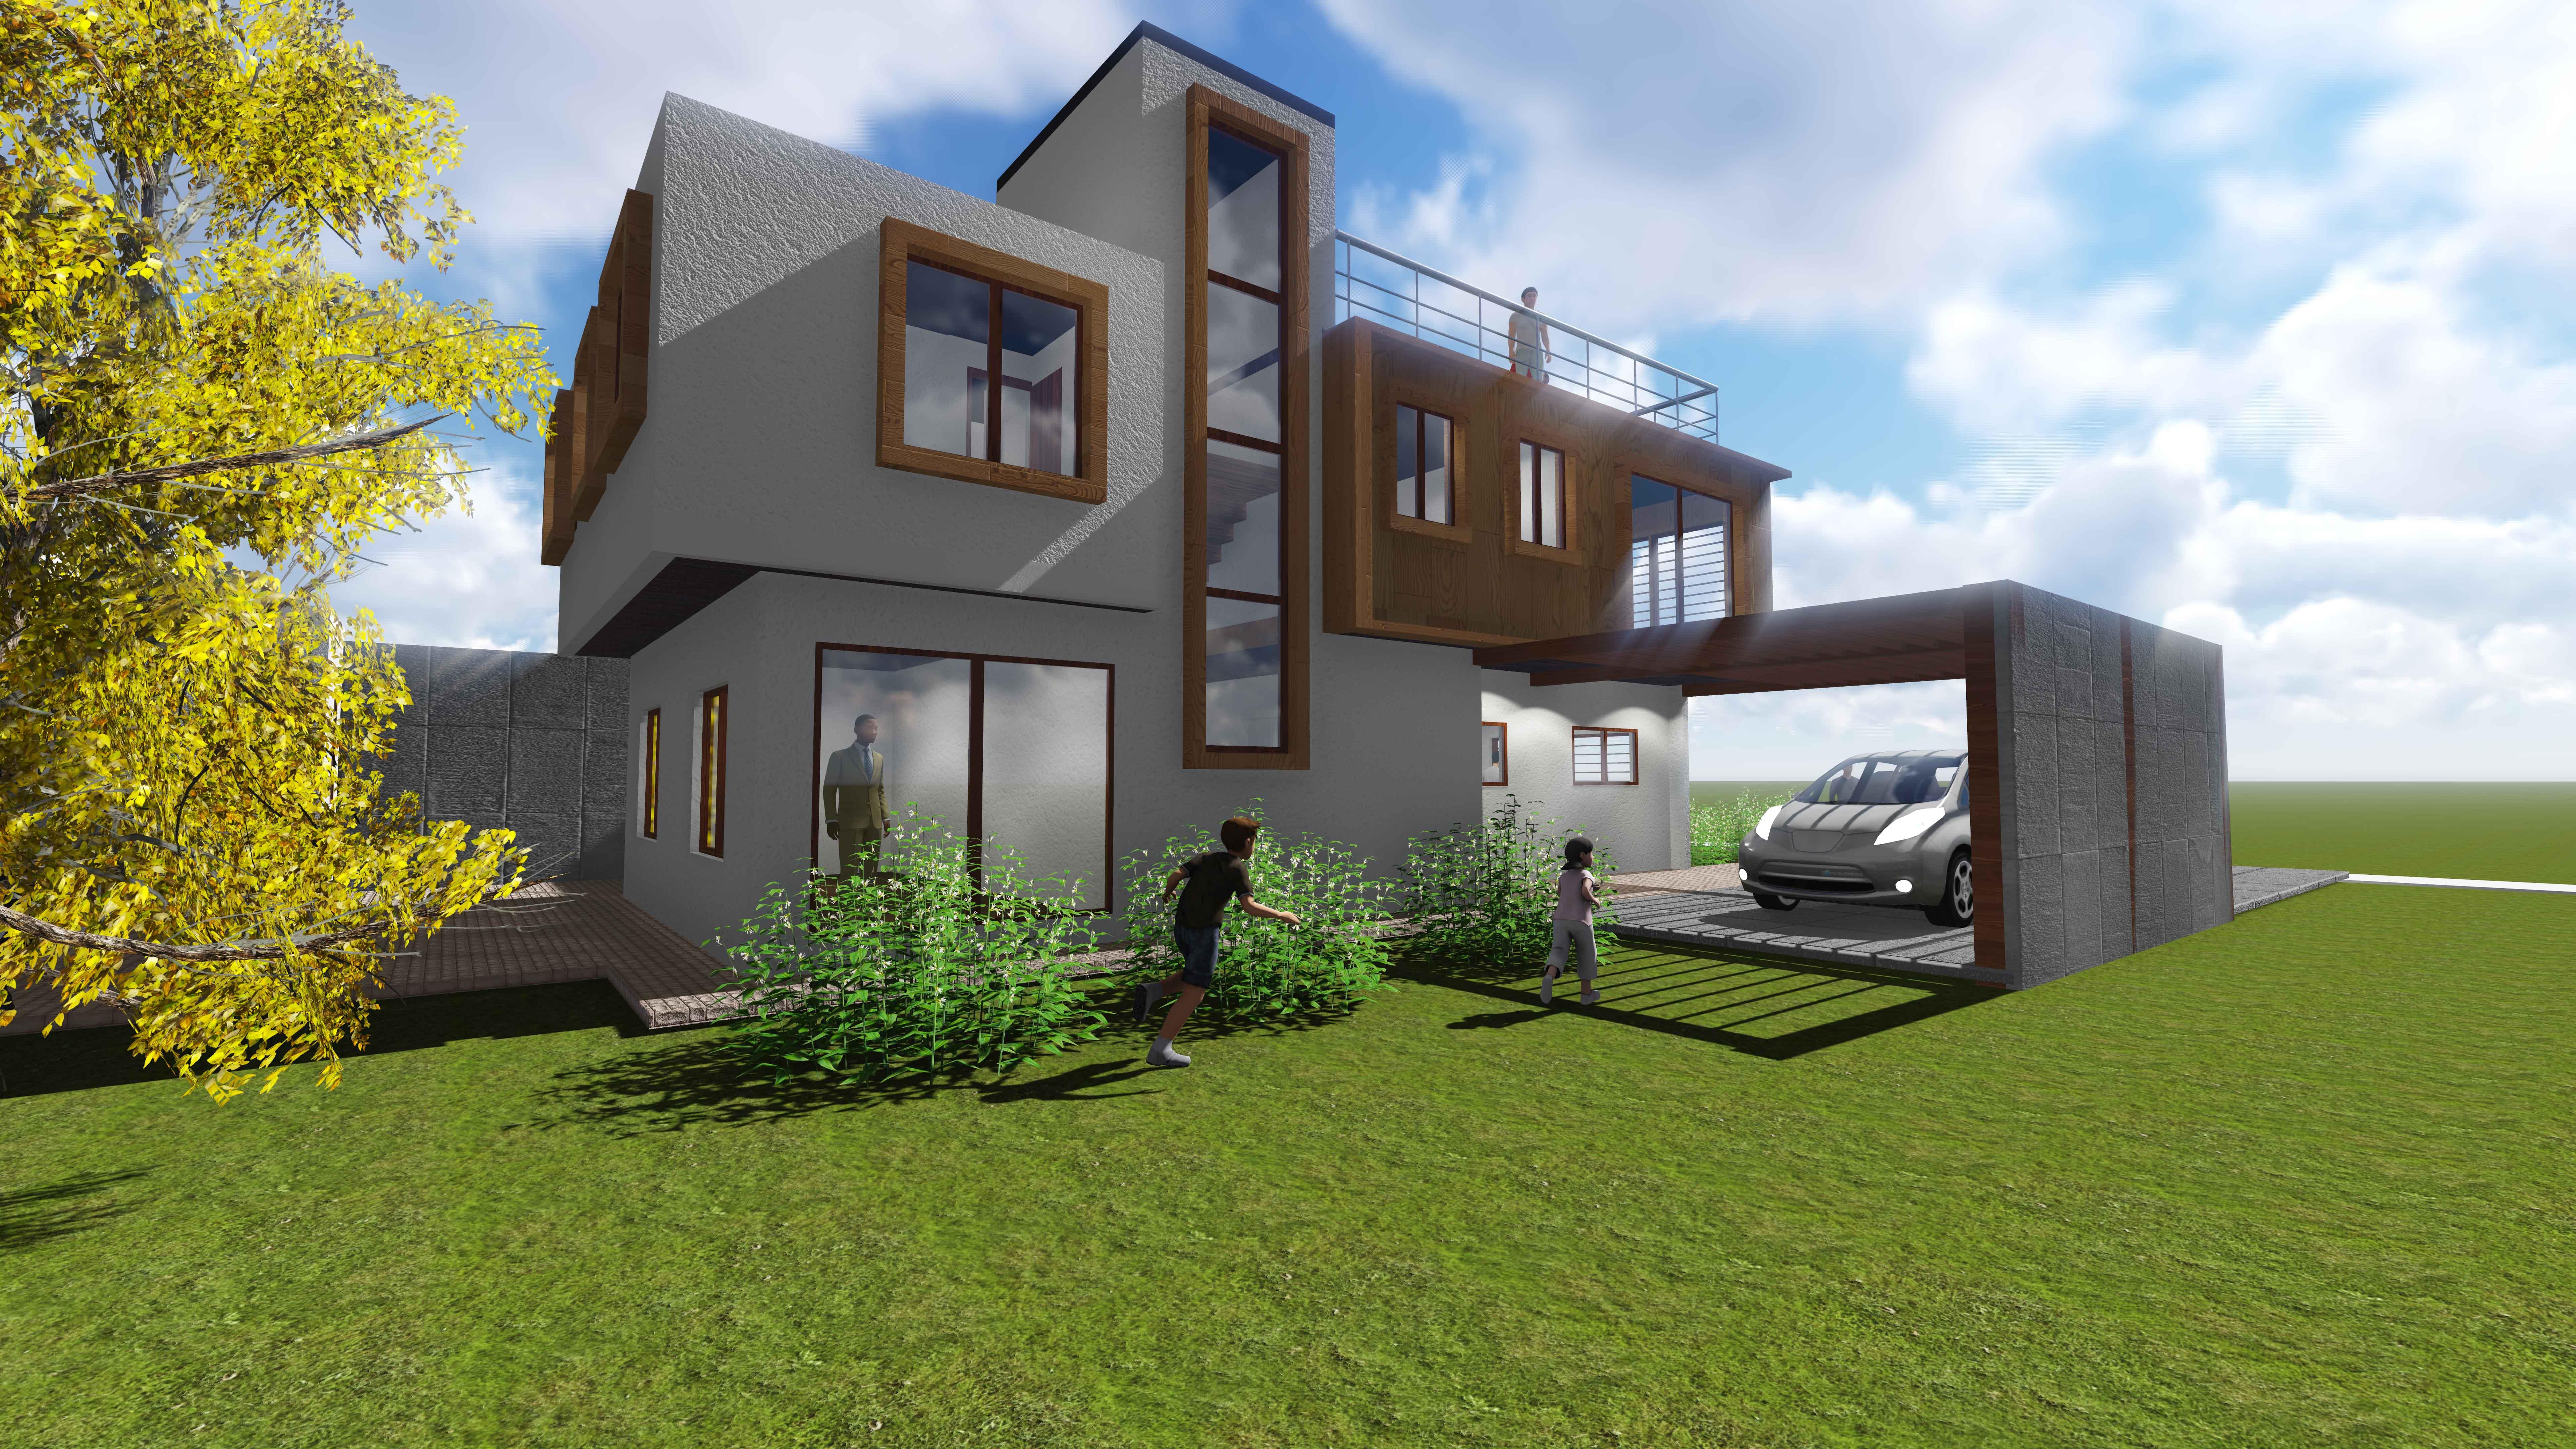 Biourban casa mislan vitacura chile for Buscar vivienda